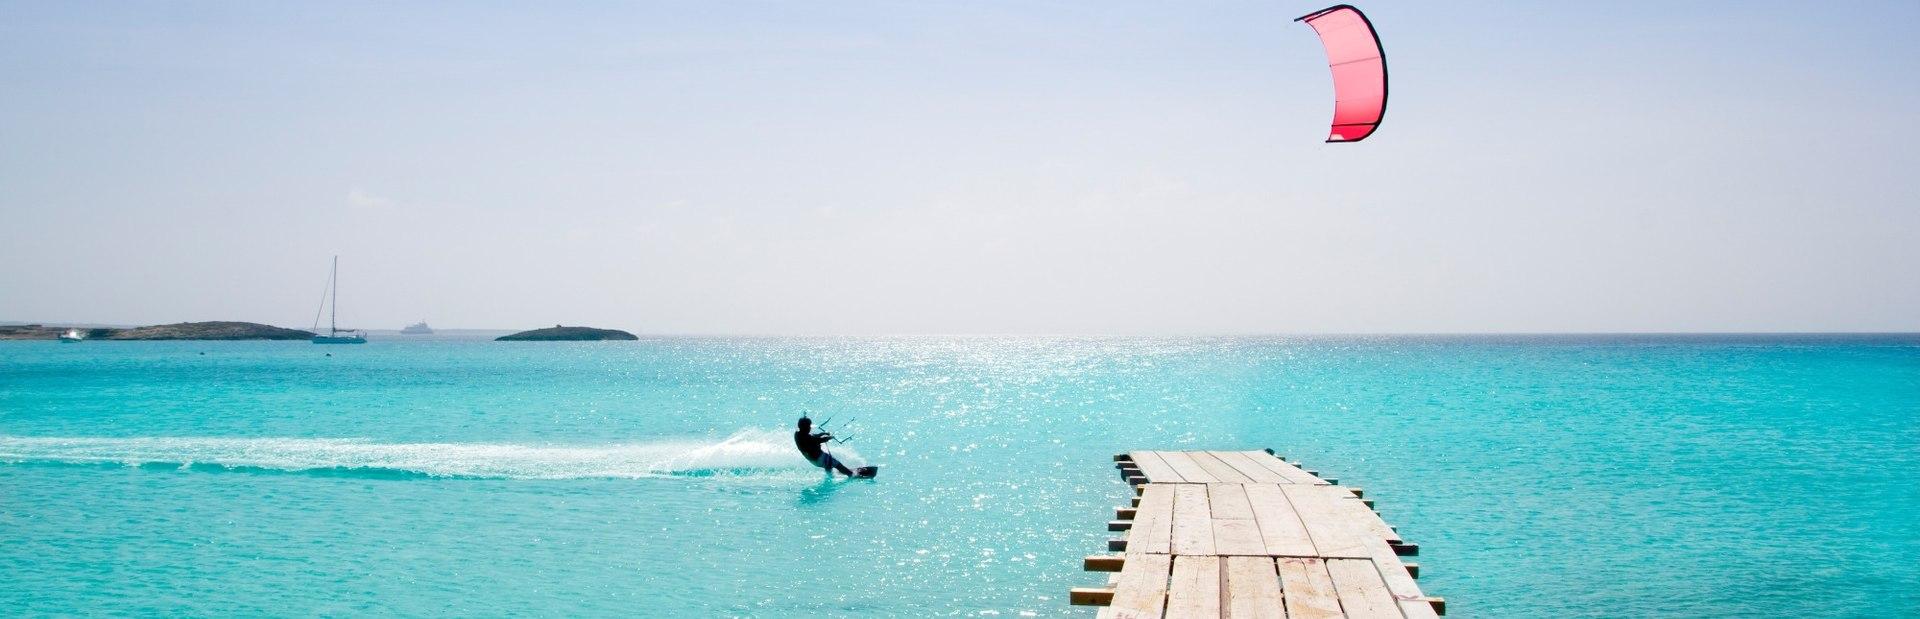 Formentera climate photo